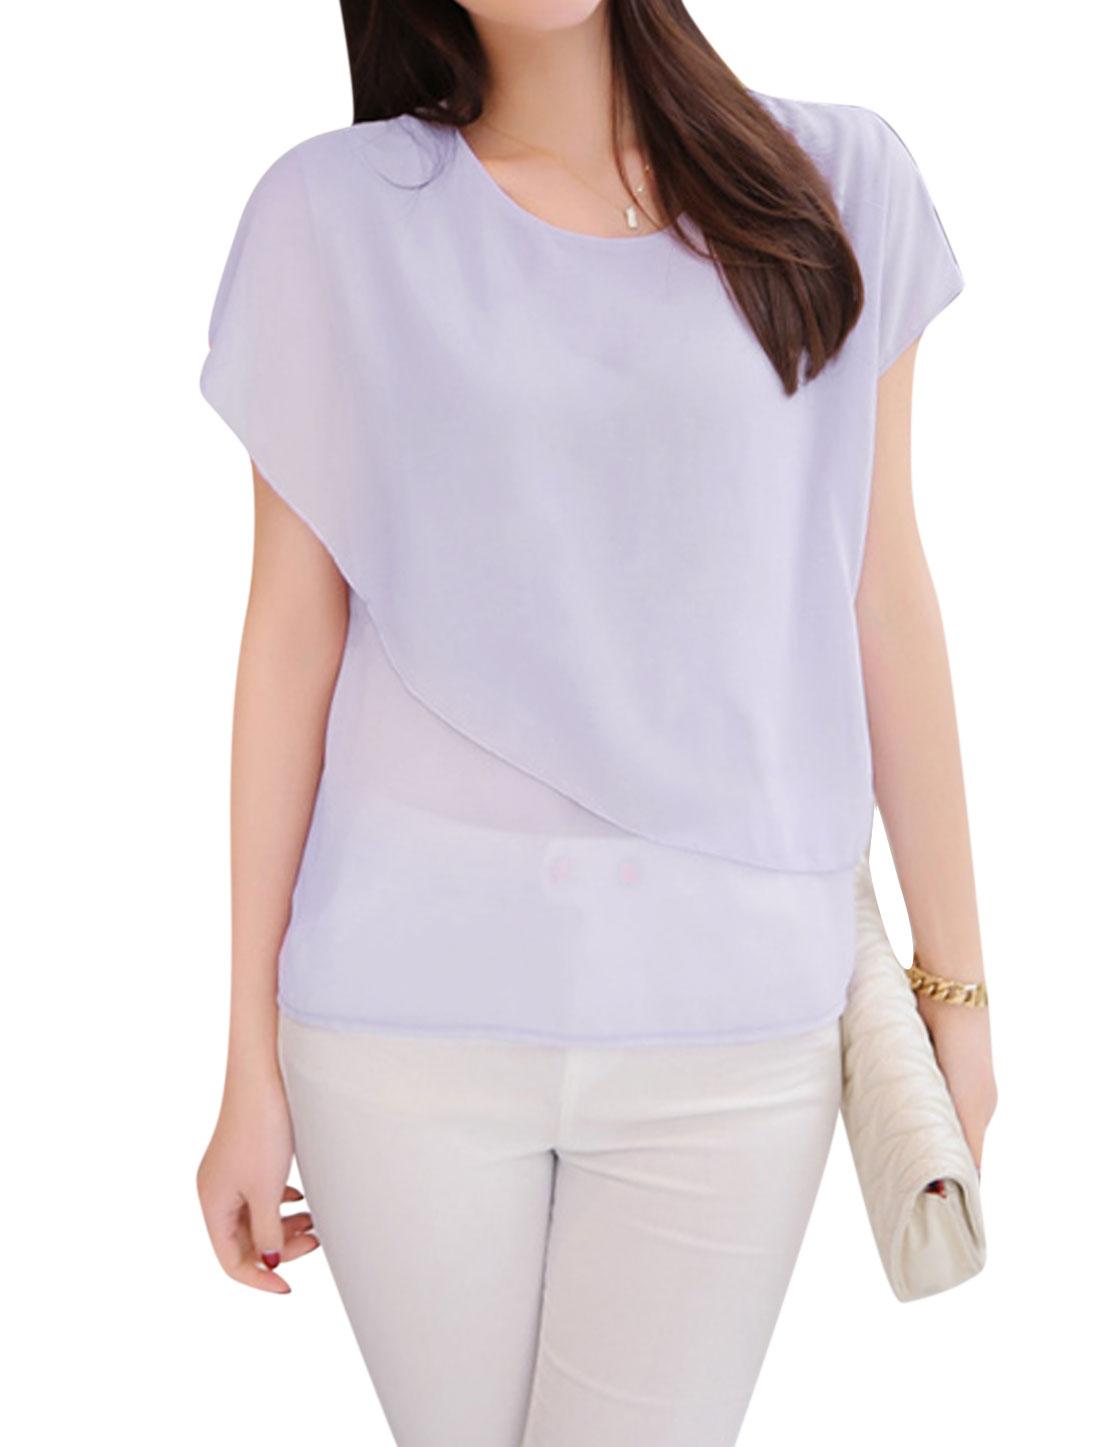 Ladies Short Sleeves Overlay Chiffon Tops Lavender XS